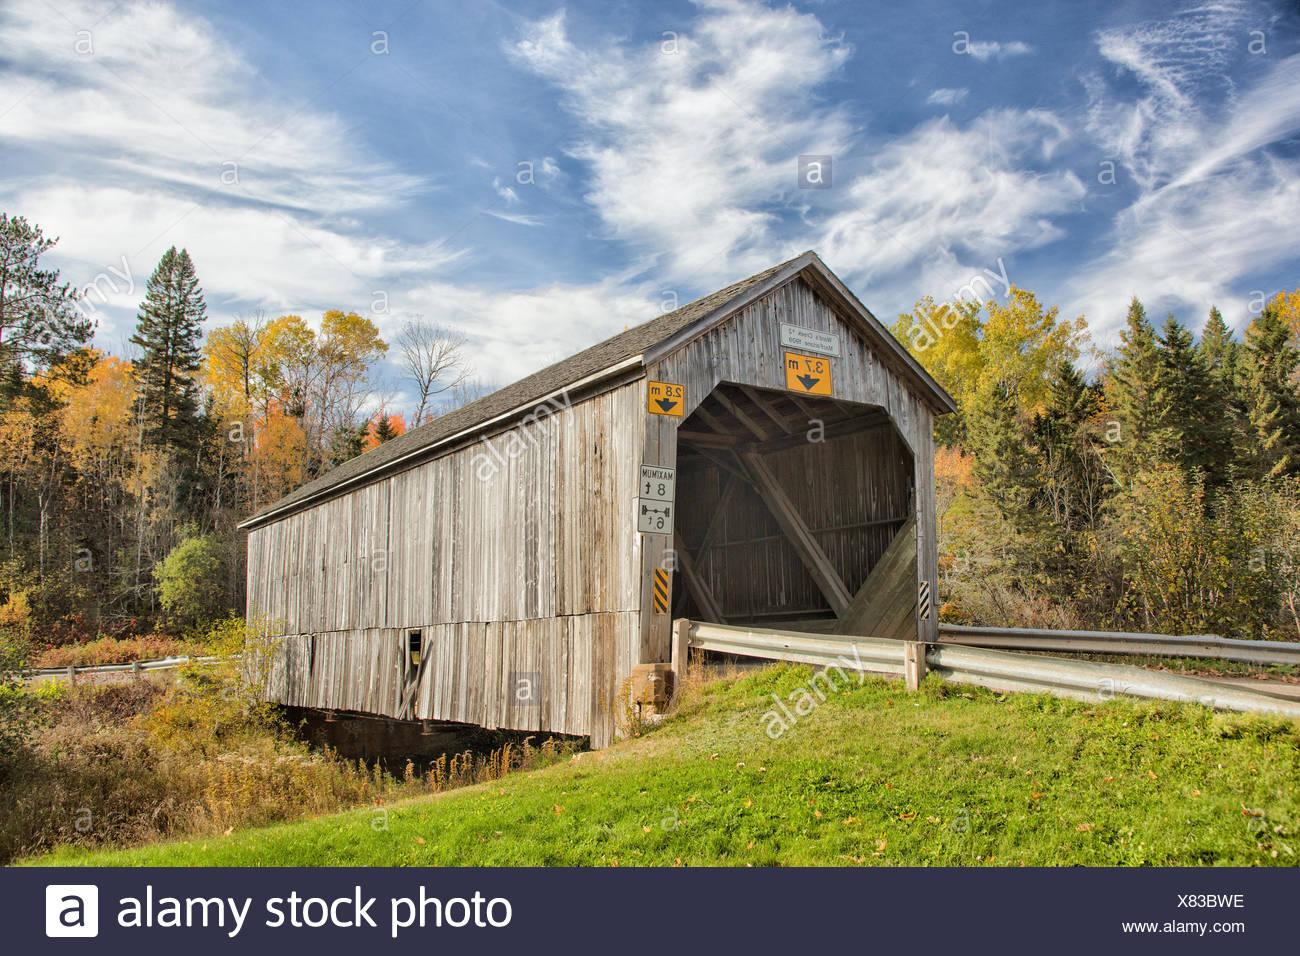 Ward's Creek #2 covered Bridge, MacFarlane, New Brunswick, Canada - Stock Image